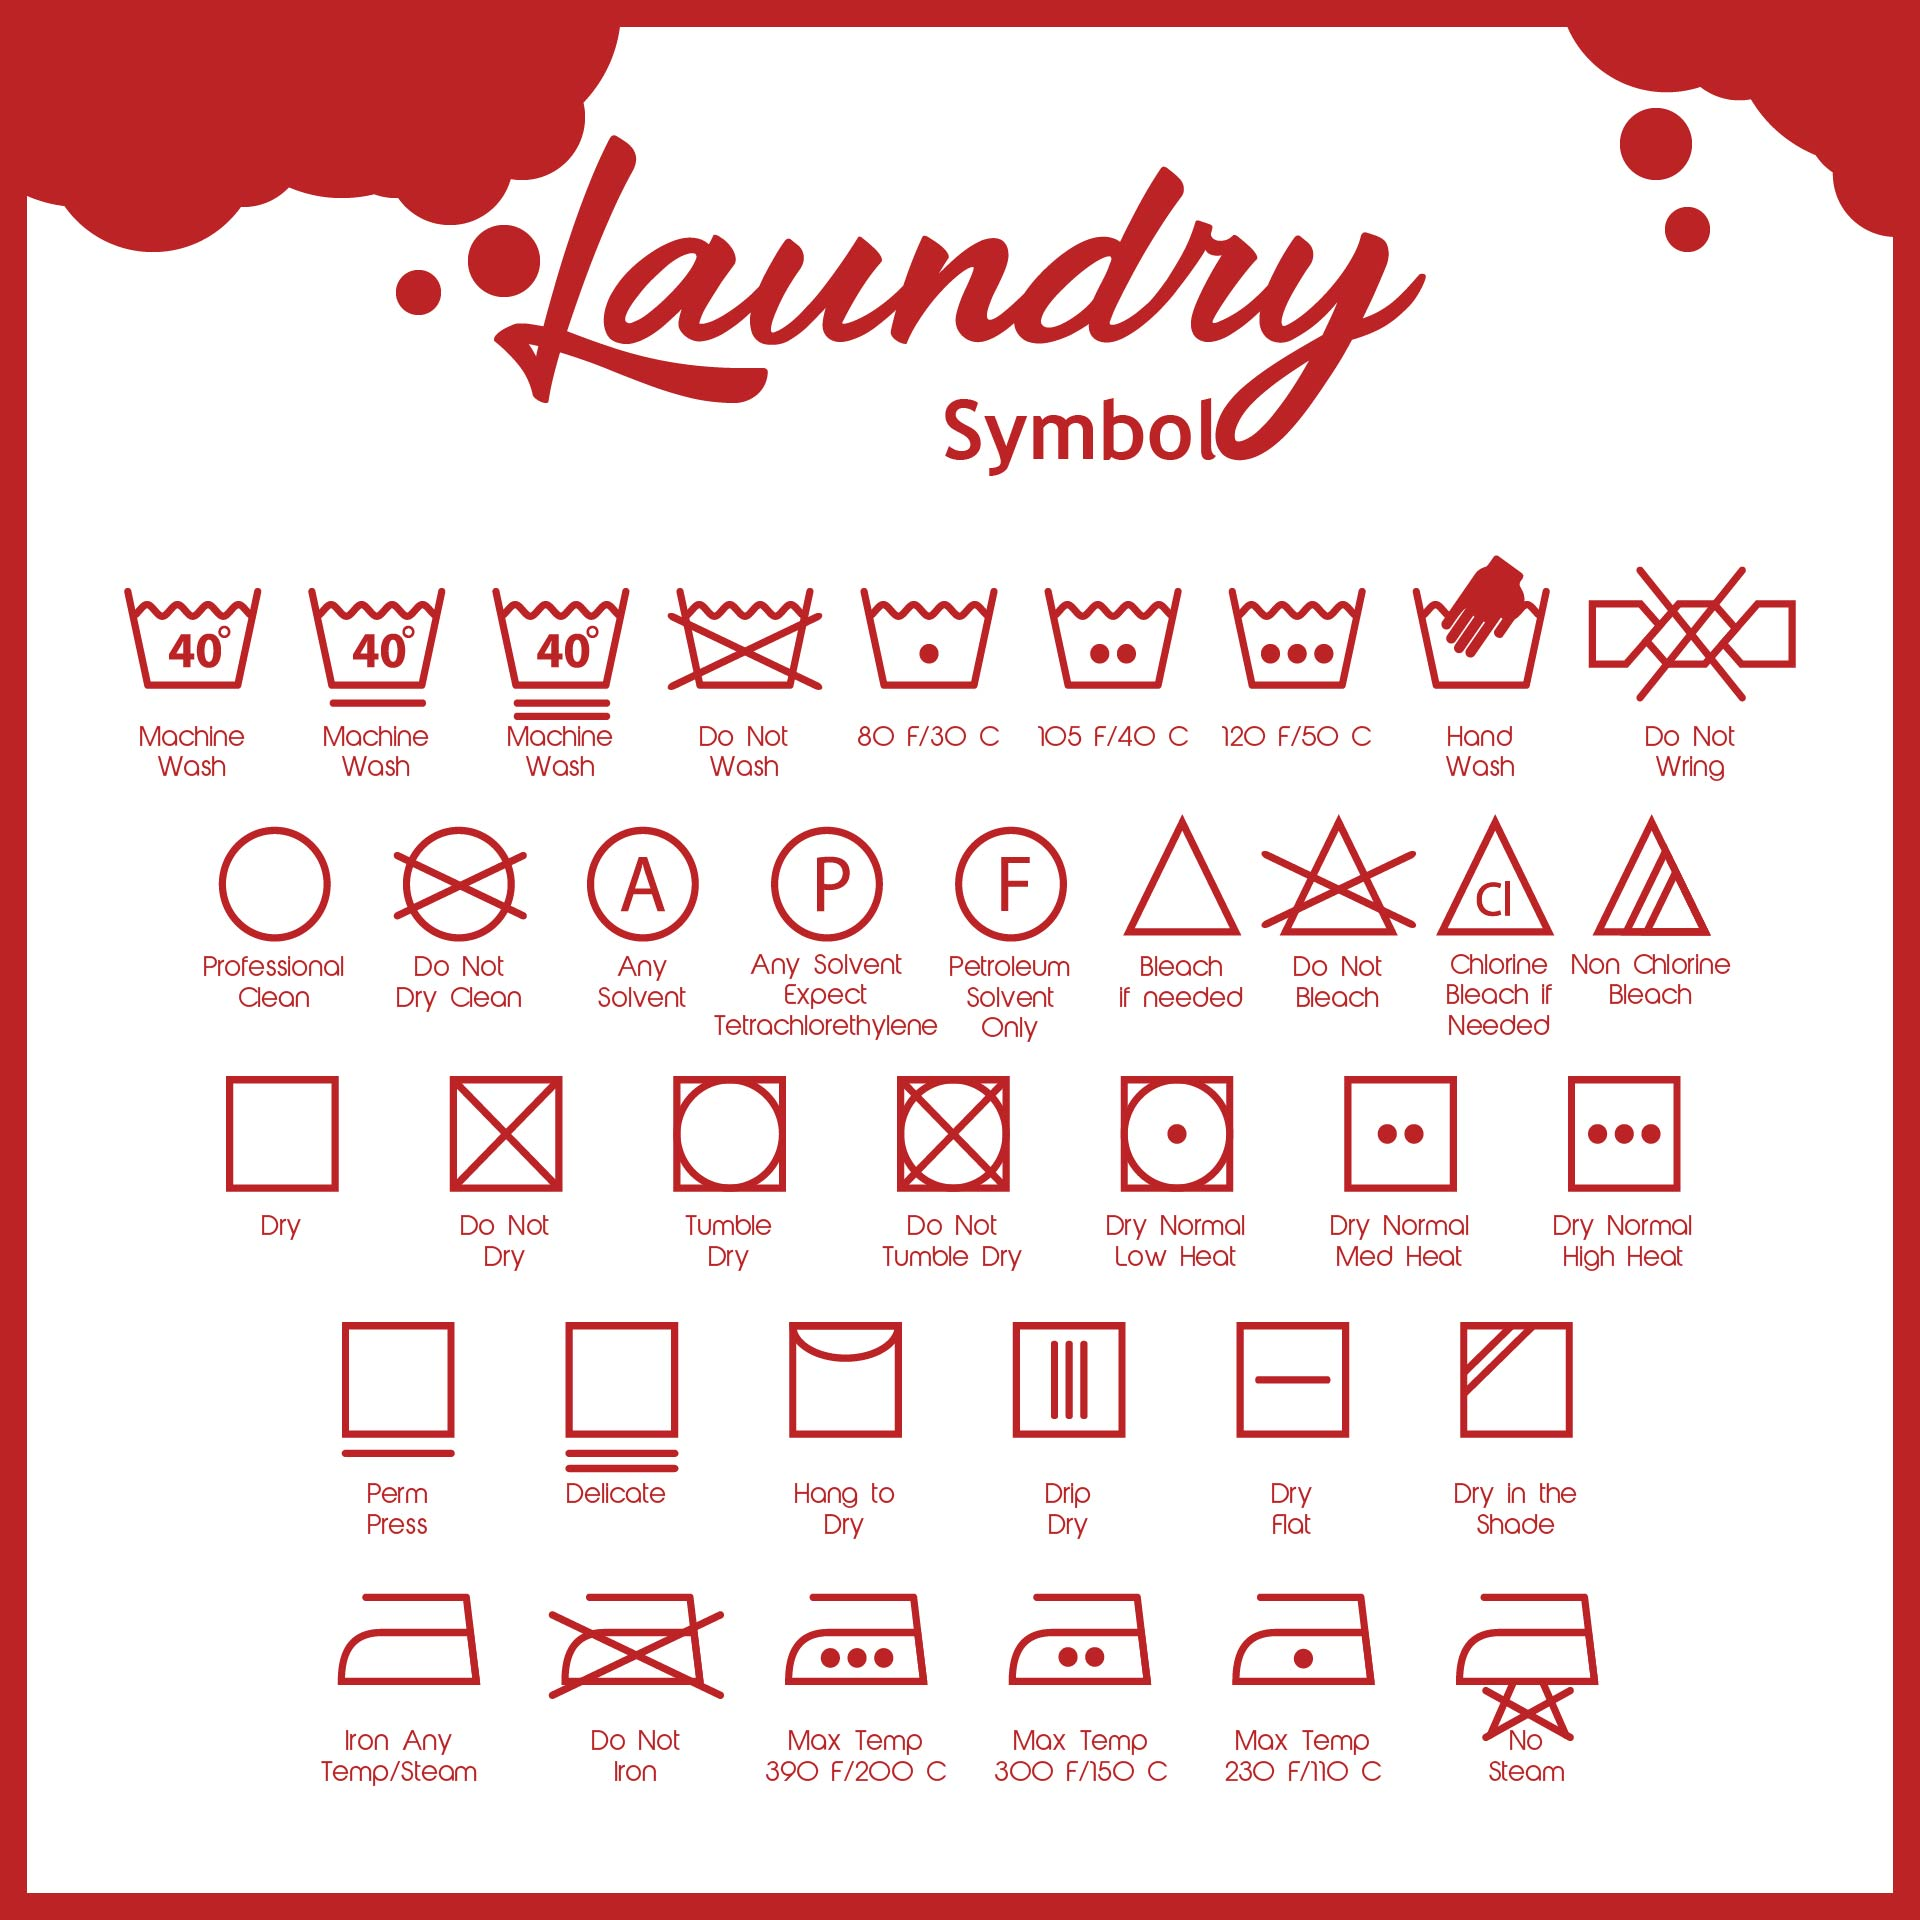 Laundry Care Symbols Guide